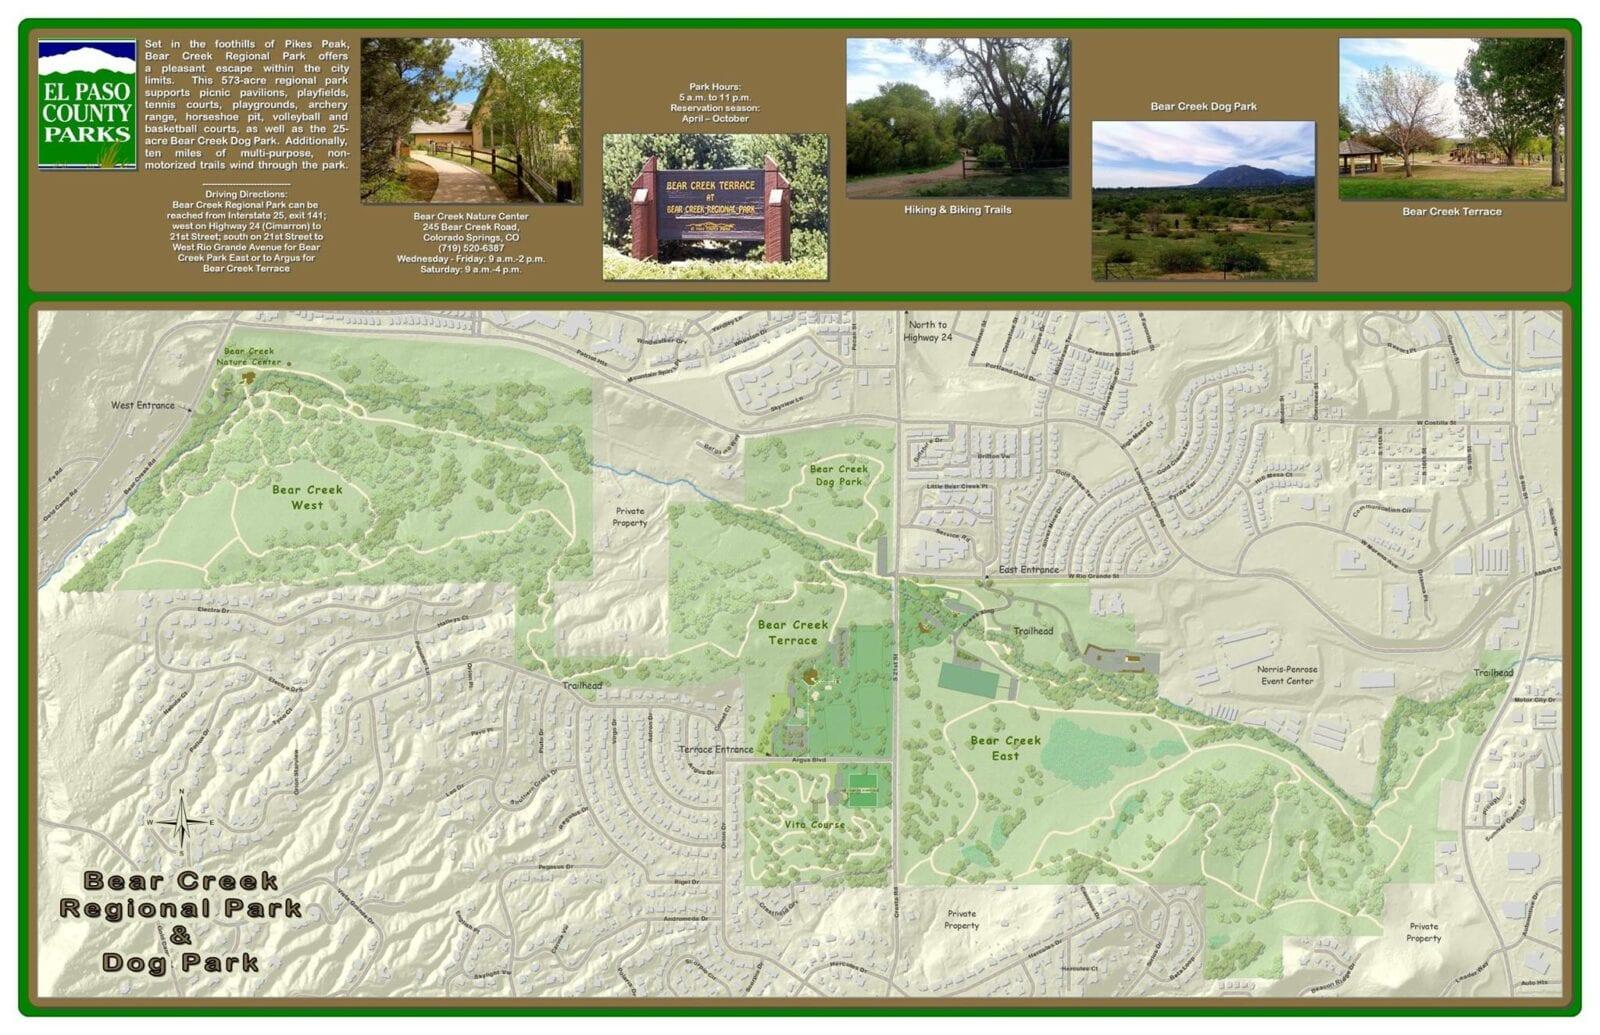 Image of the Bear Creek Regional Park & Dog Park map in Colorado Springs, Colorado